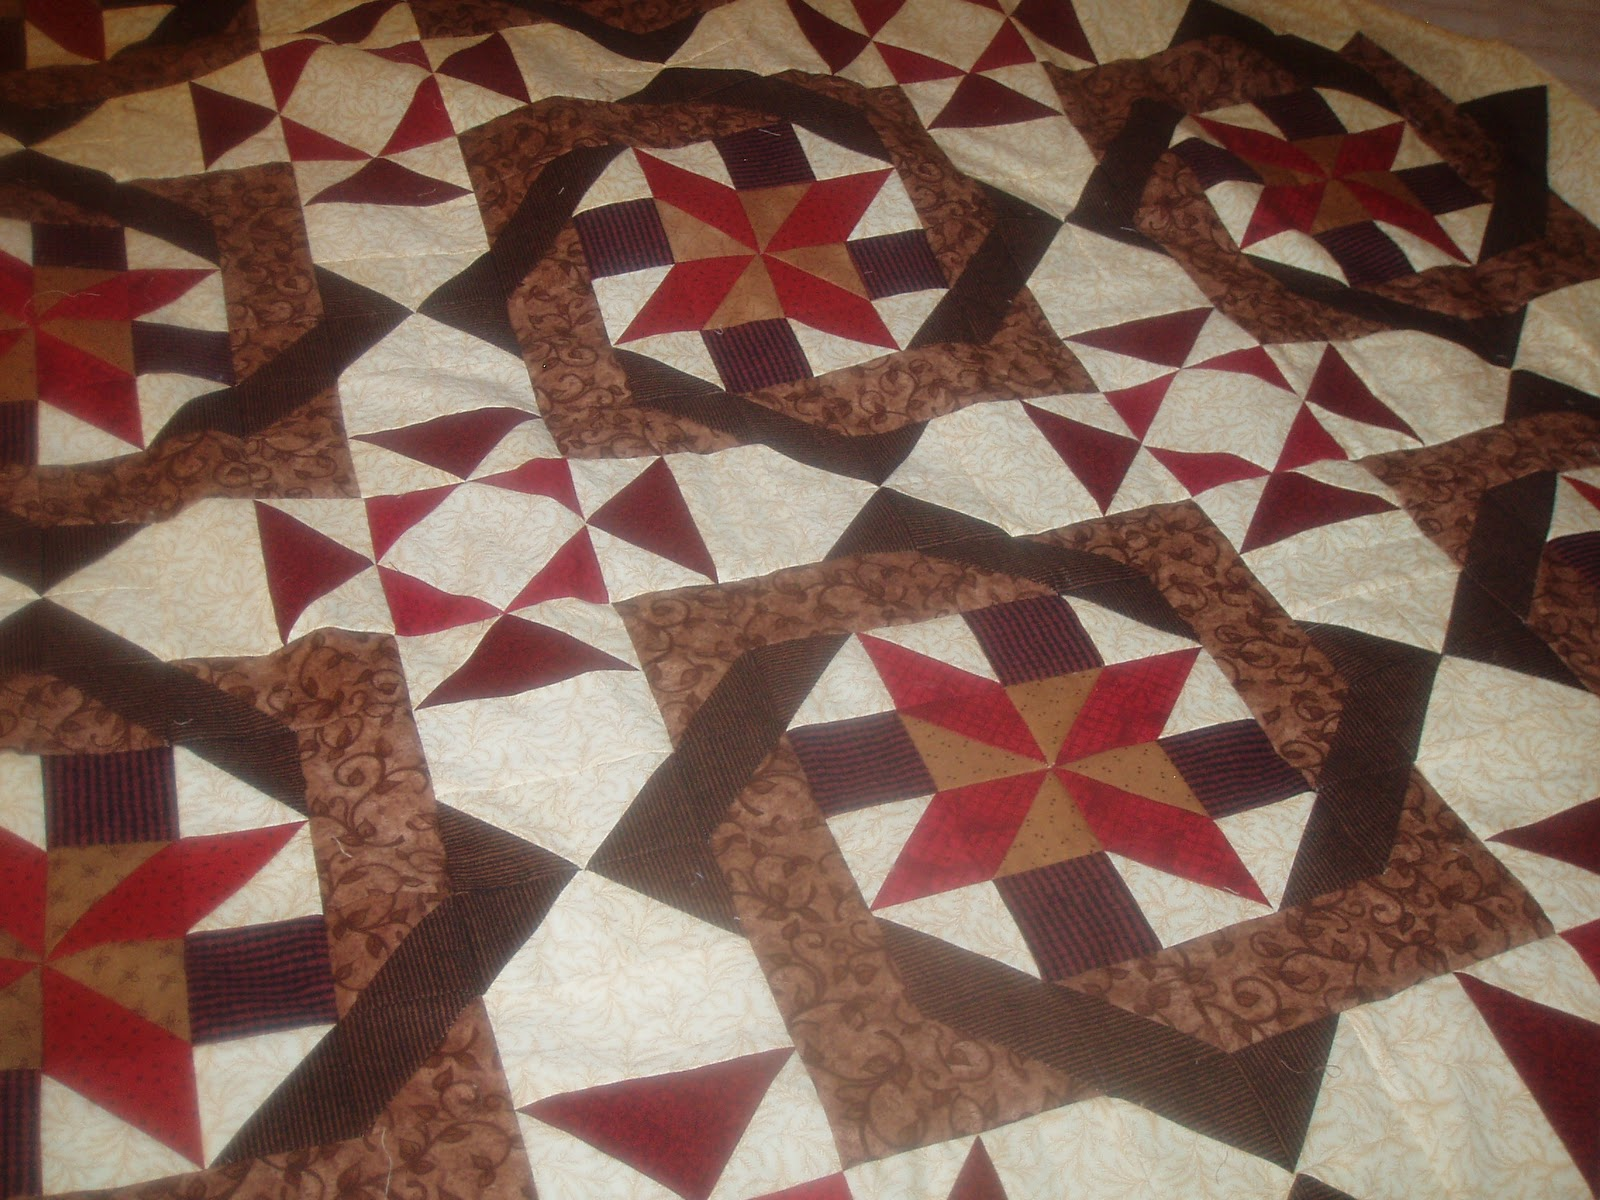 Easy Quilt Patterns For Guys : Quilt Patterns For Men